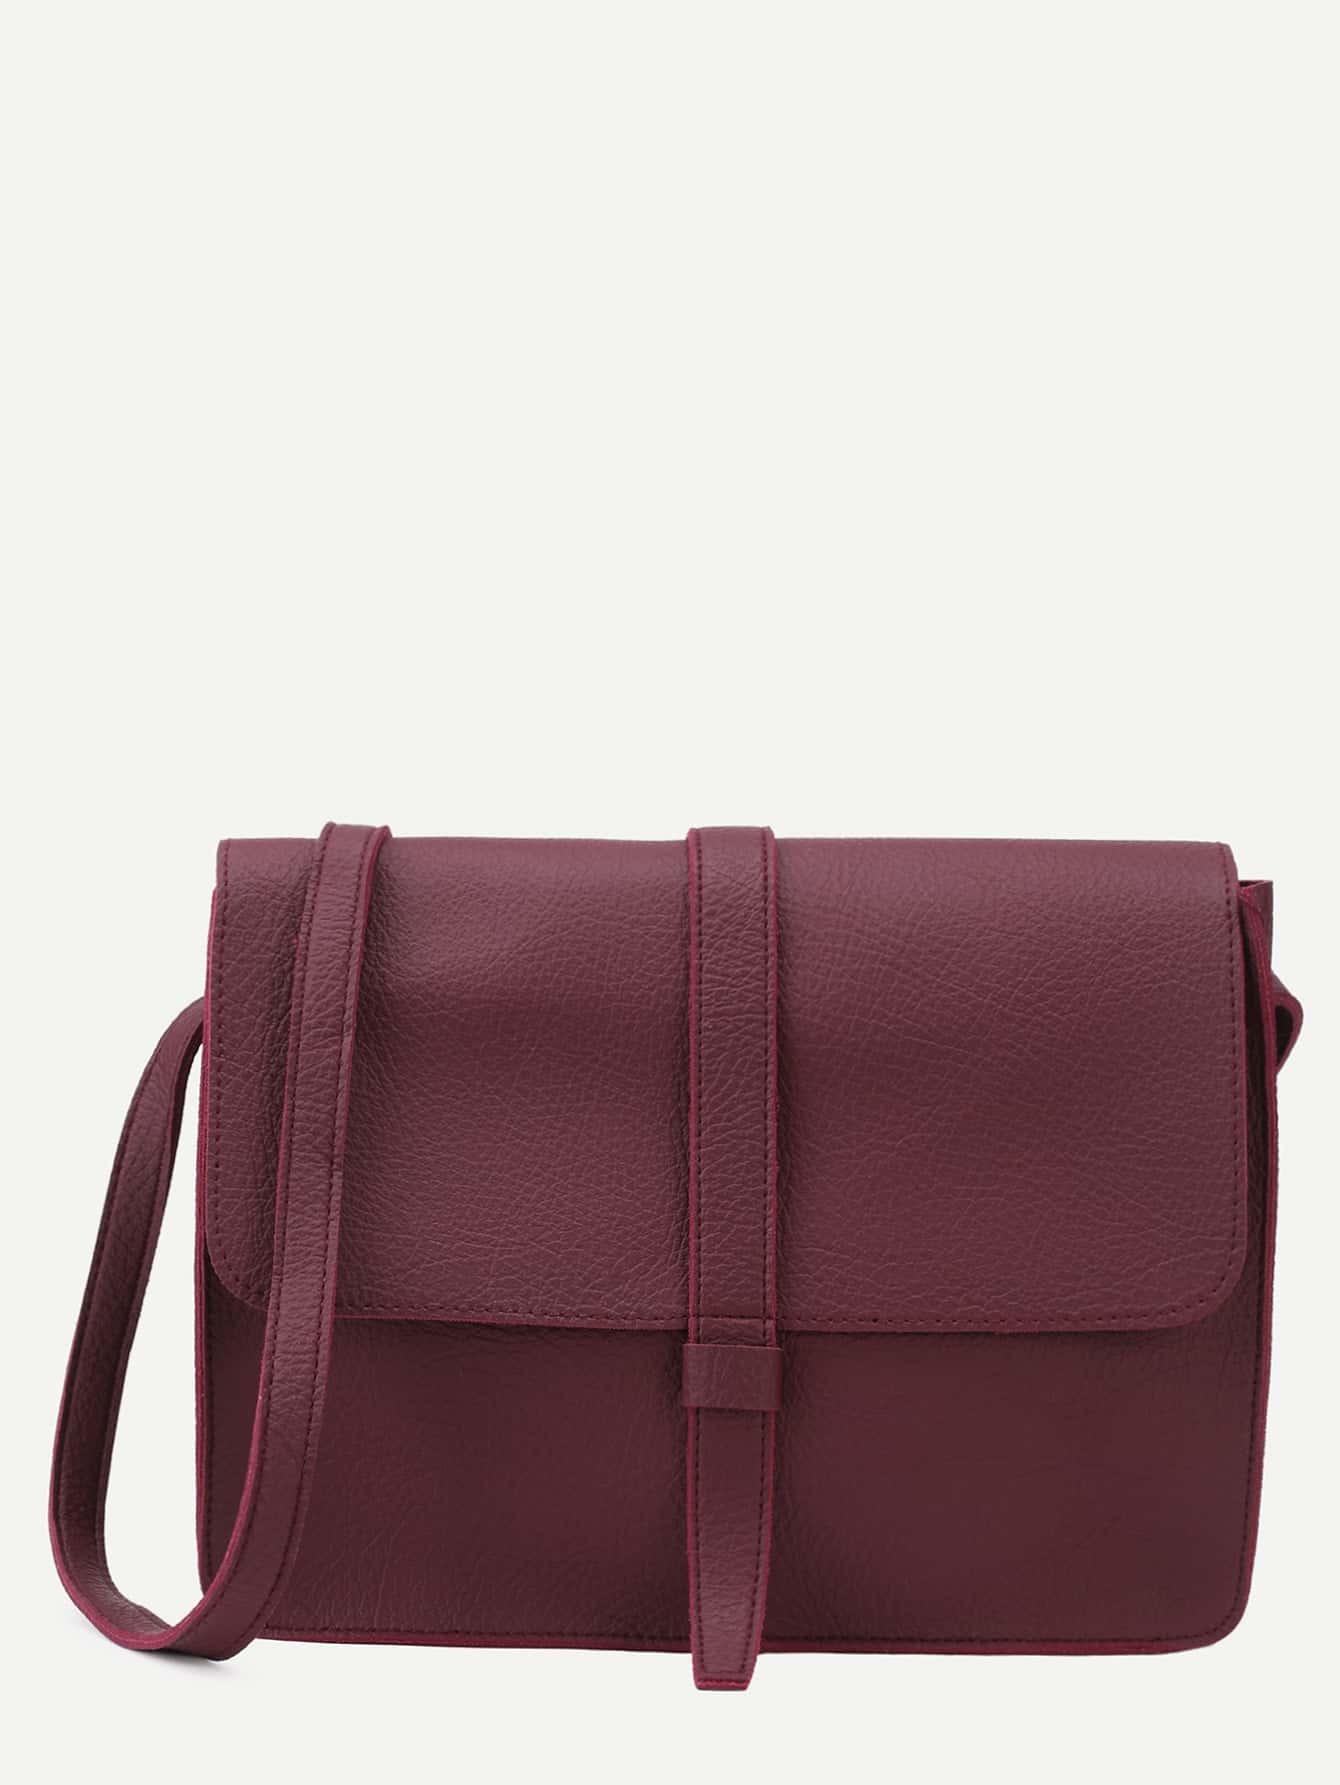 bag160922907_2